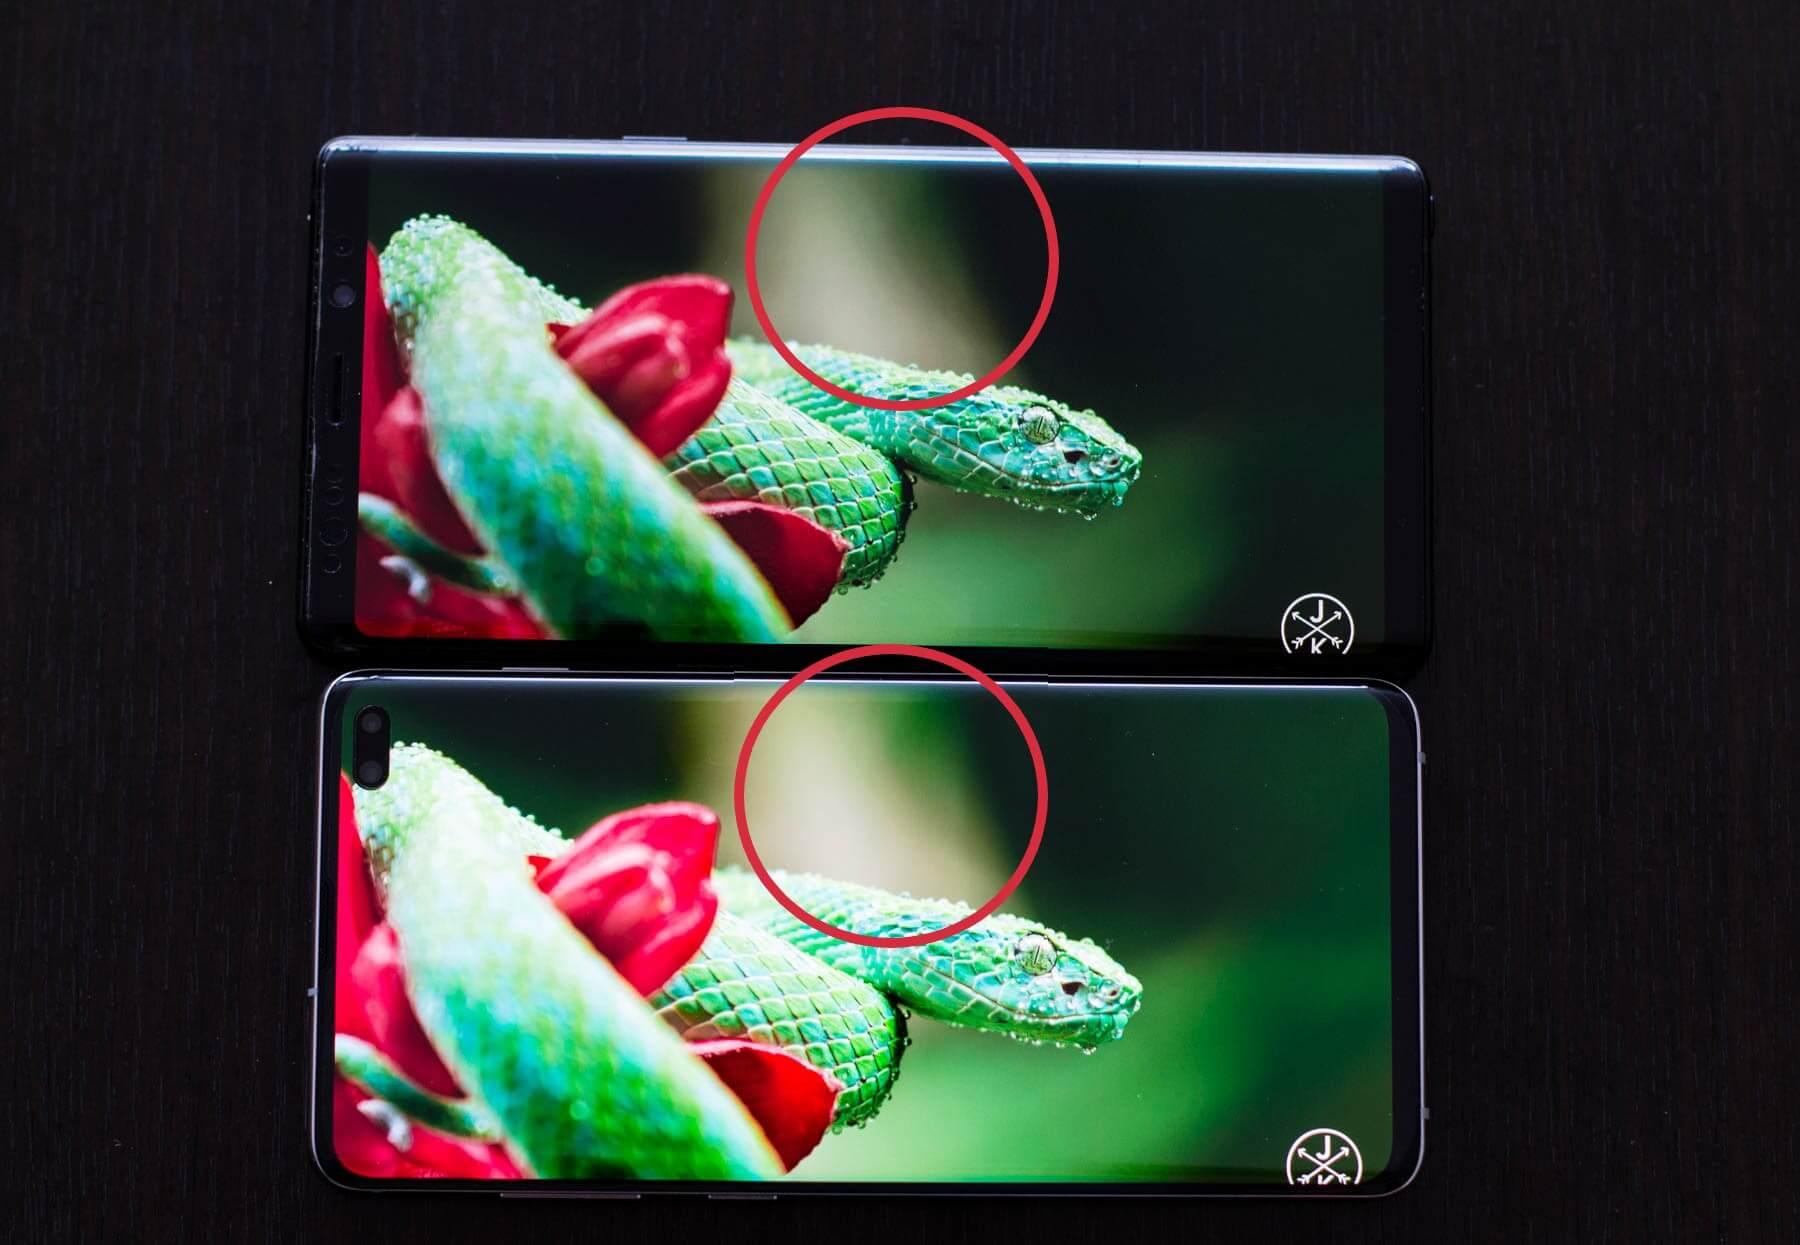 Сравнение экрана Galaxy Note 9 и Galaxy S10 Plus